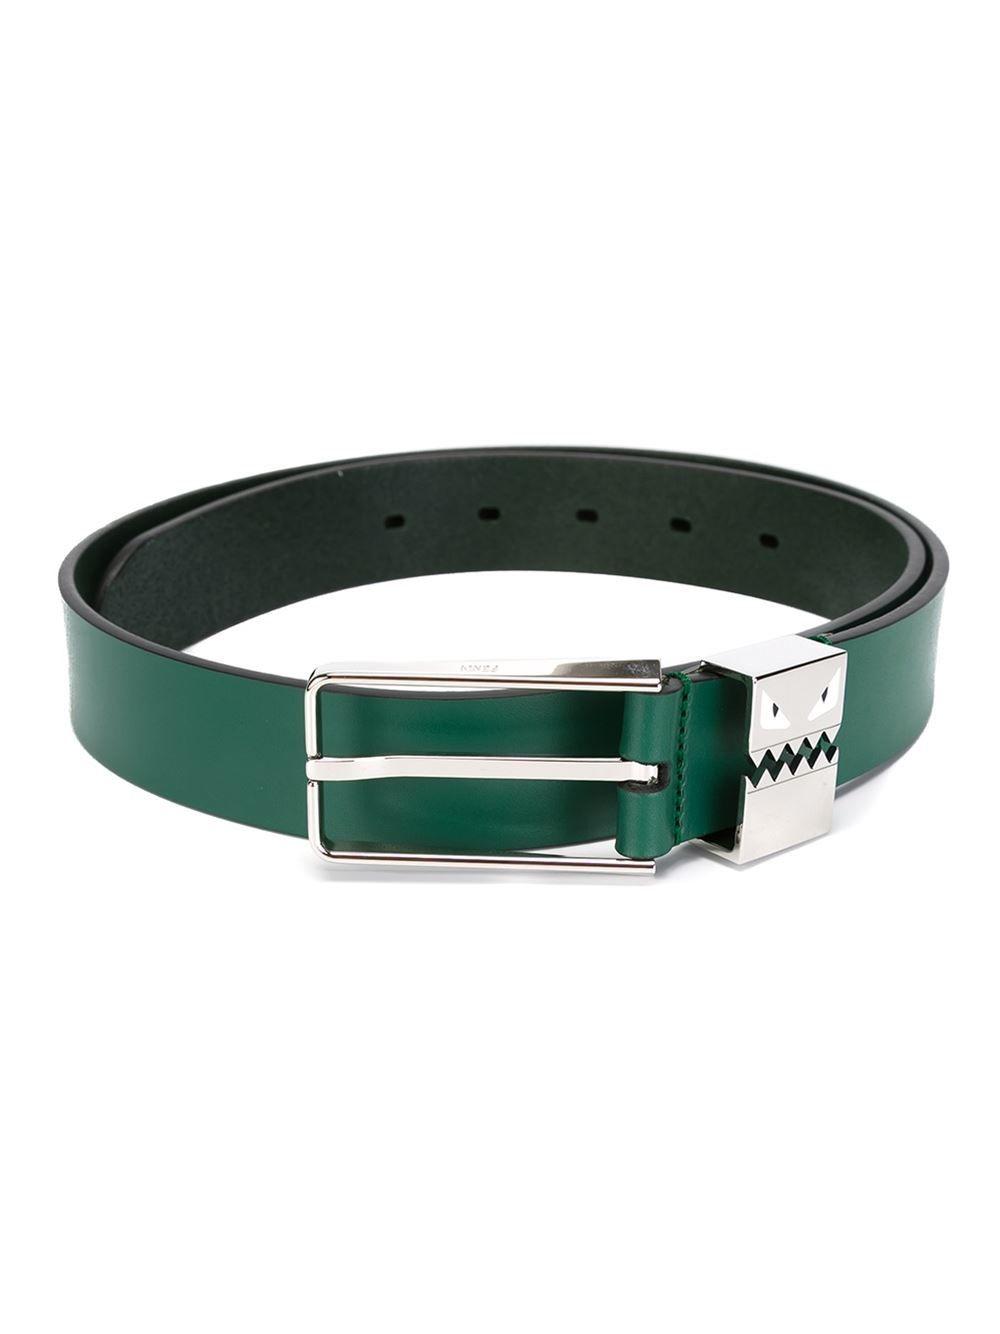 belts on   fashion trends   Fendi bag bugs, Fendi, Fendi belt 6e40a29376